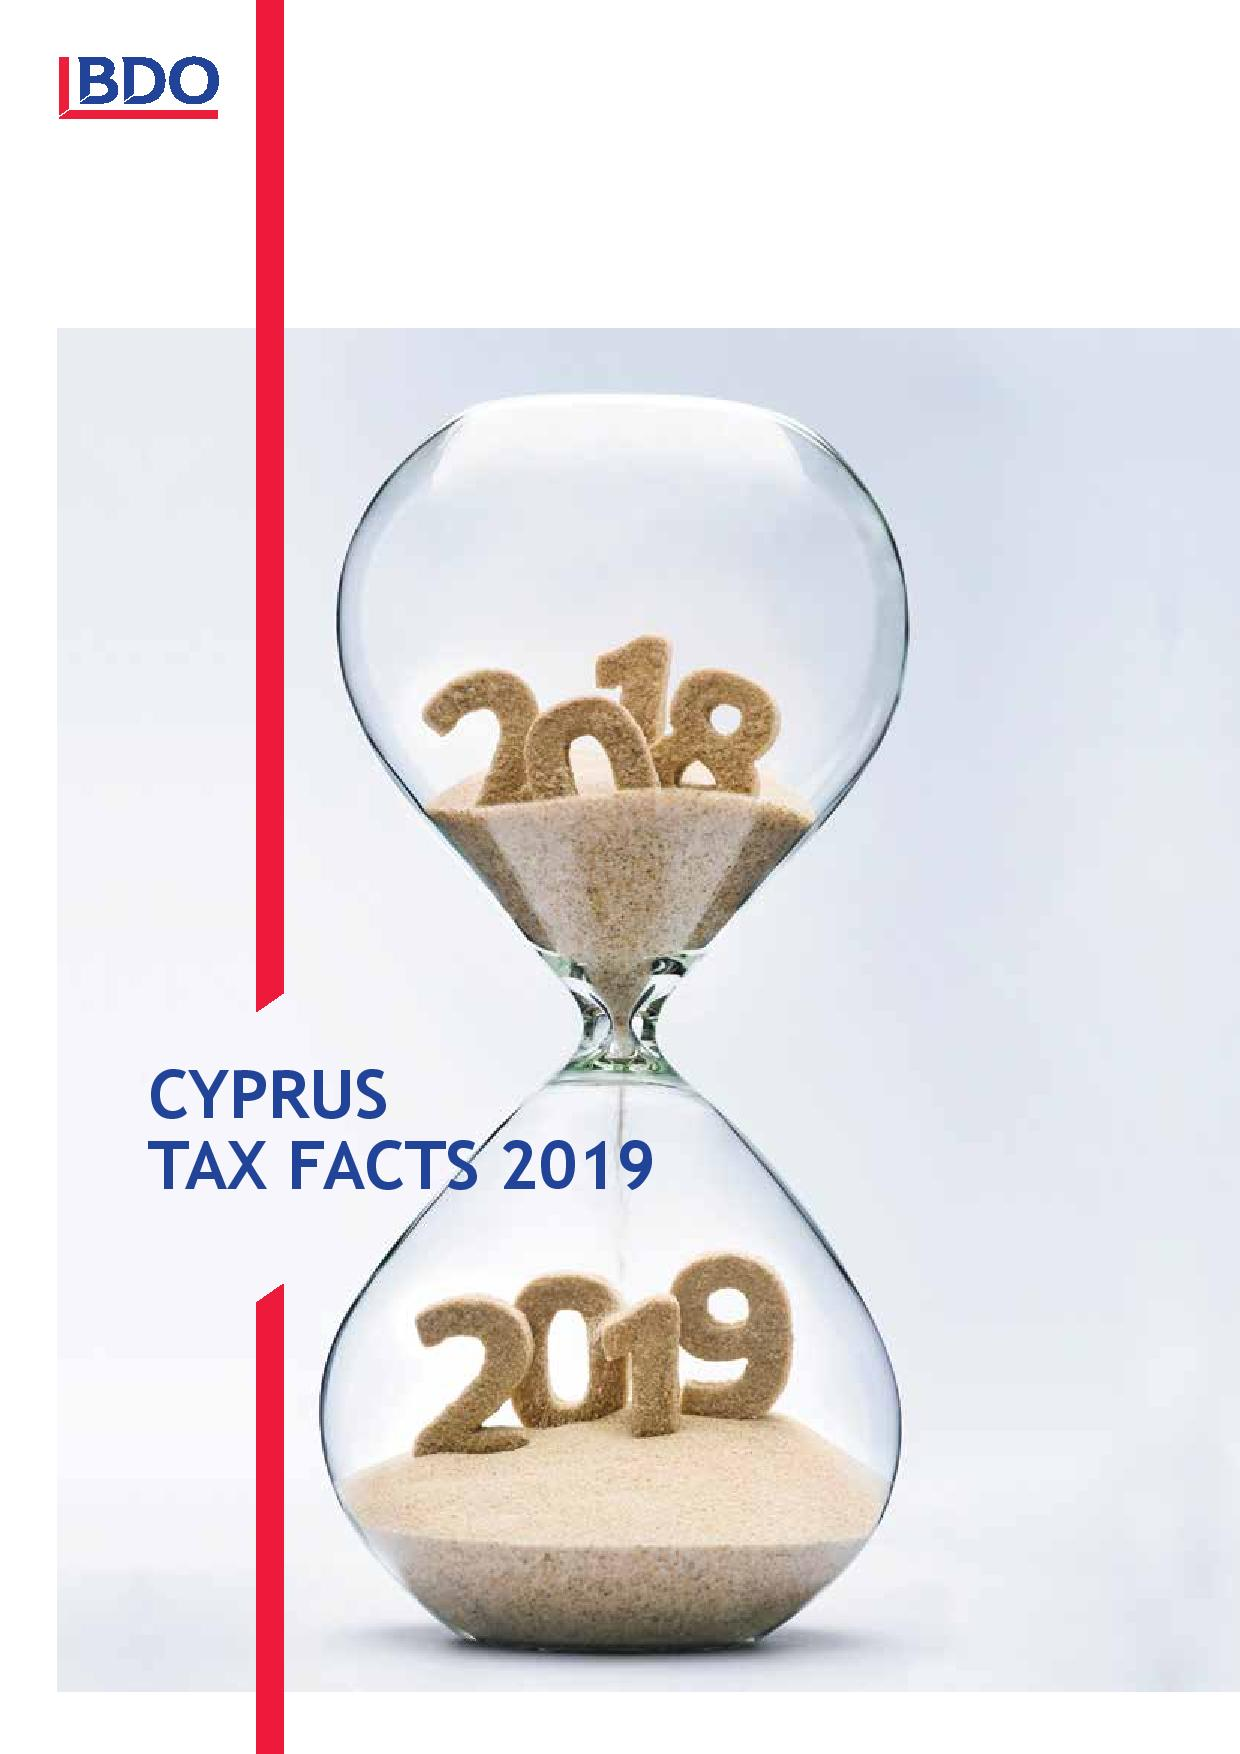 BDO: Cyprus Tax Facts 2019